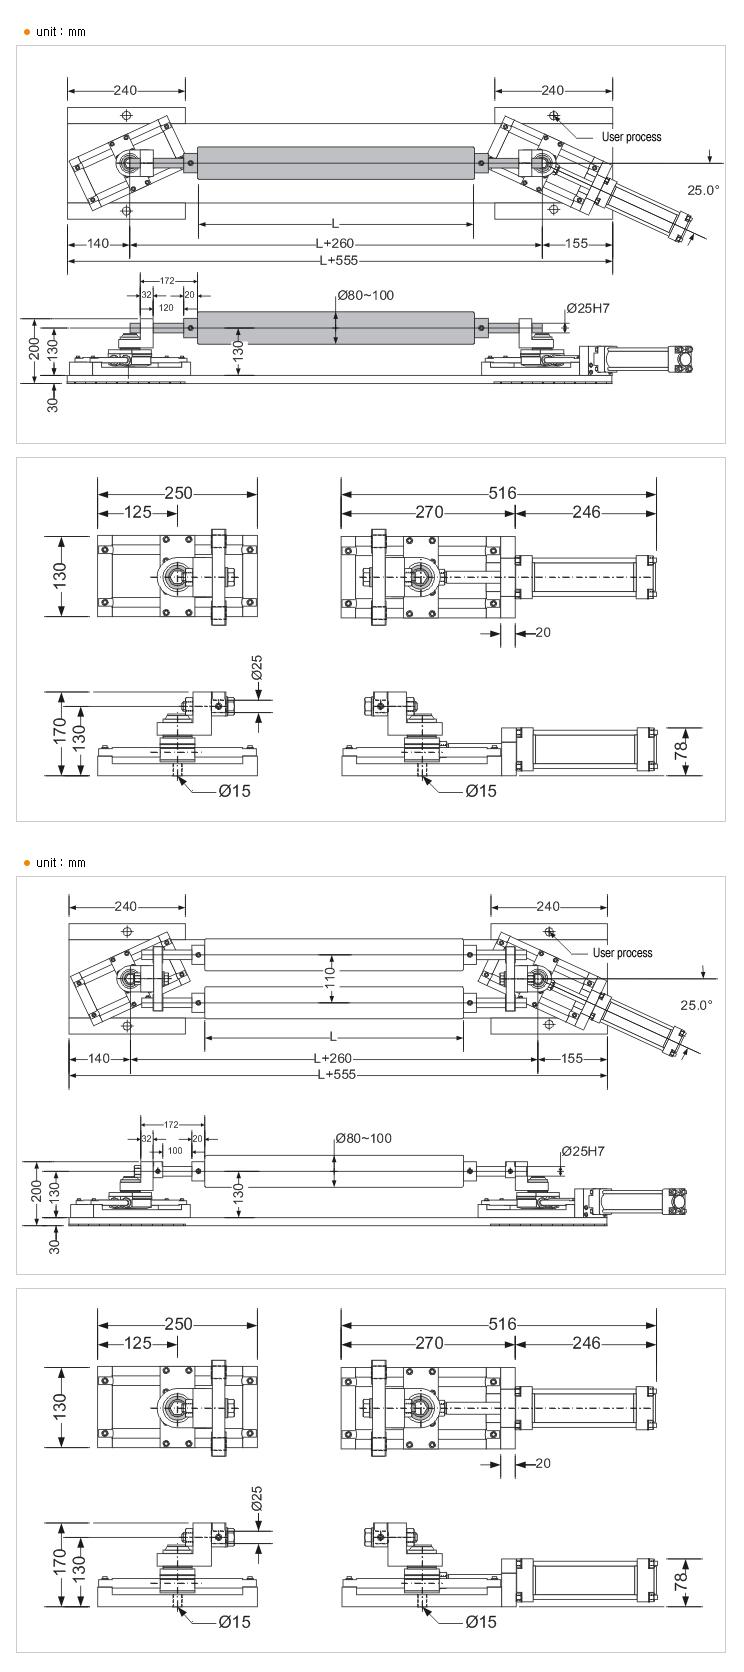 HANMI ELECTRONICS Hydraulic Actuator (END PIVOT TYPE  (S-16 SINGLE ROLL/DOUBLE ROLL))